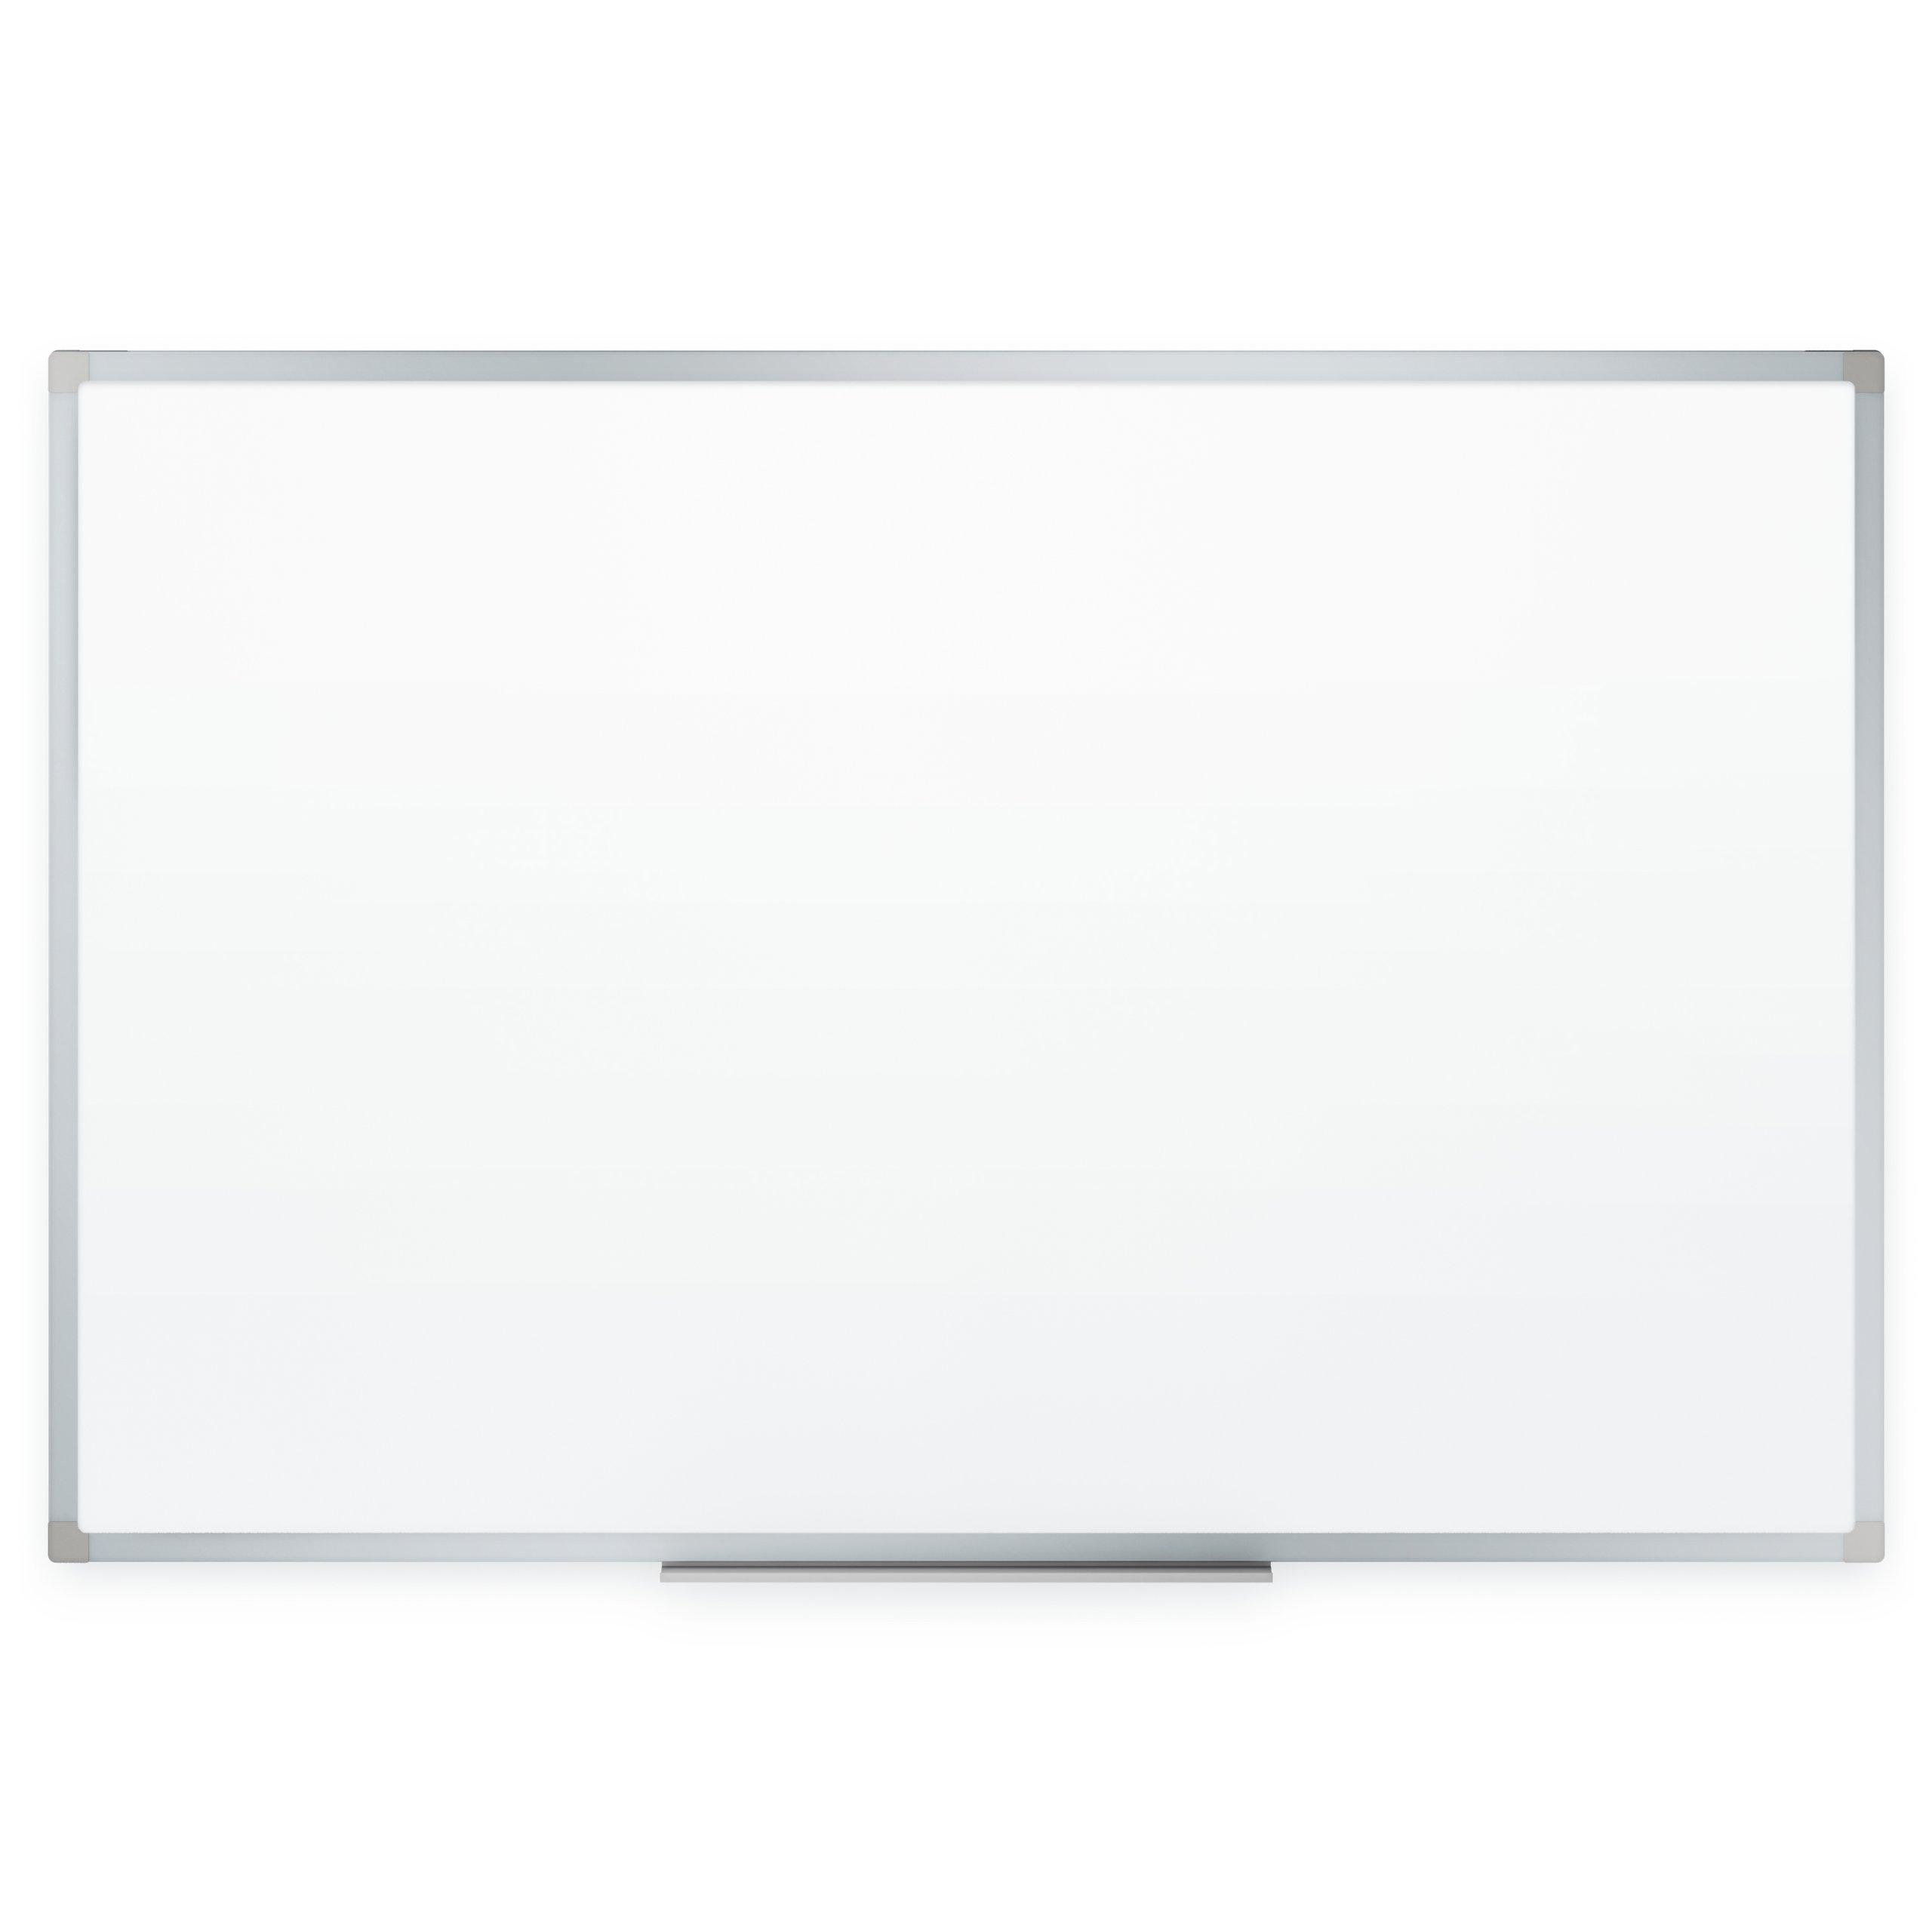 Mead Classic Whiteboard, 6 x 4 Feet, Aluminum Frame (85358)